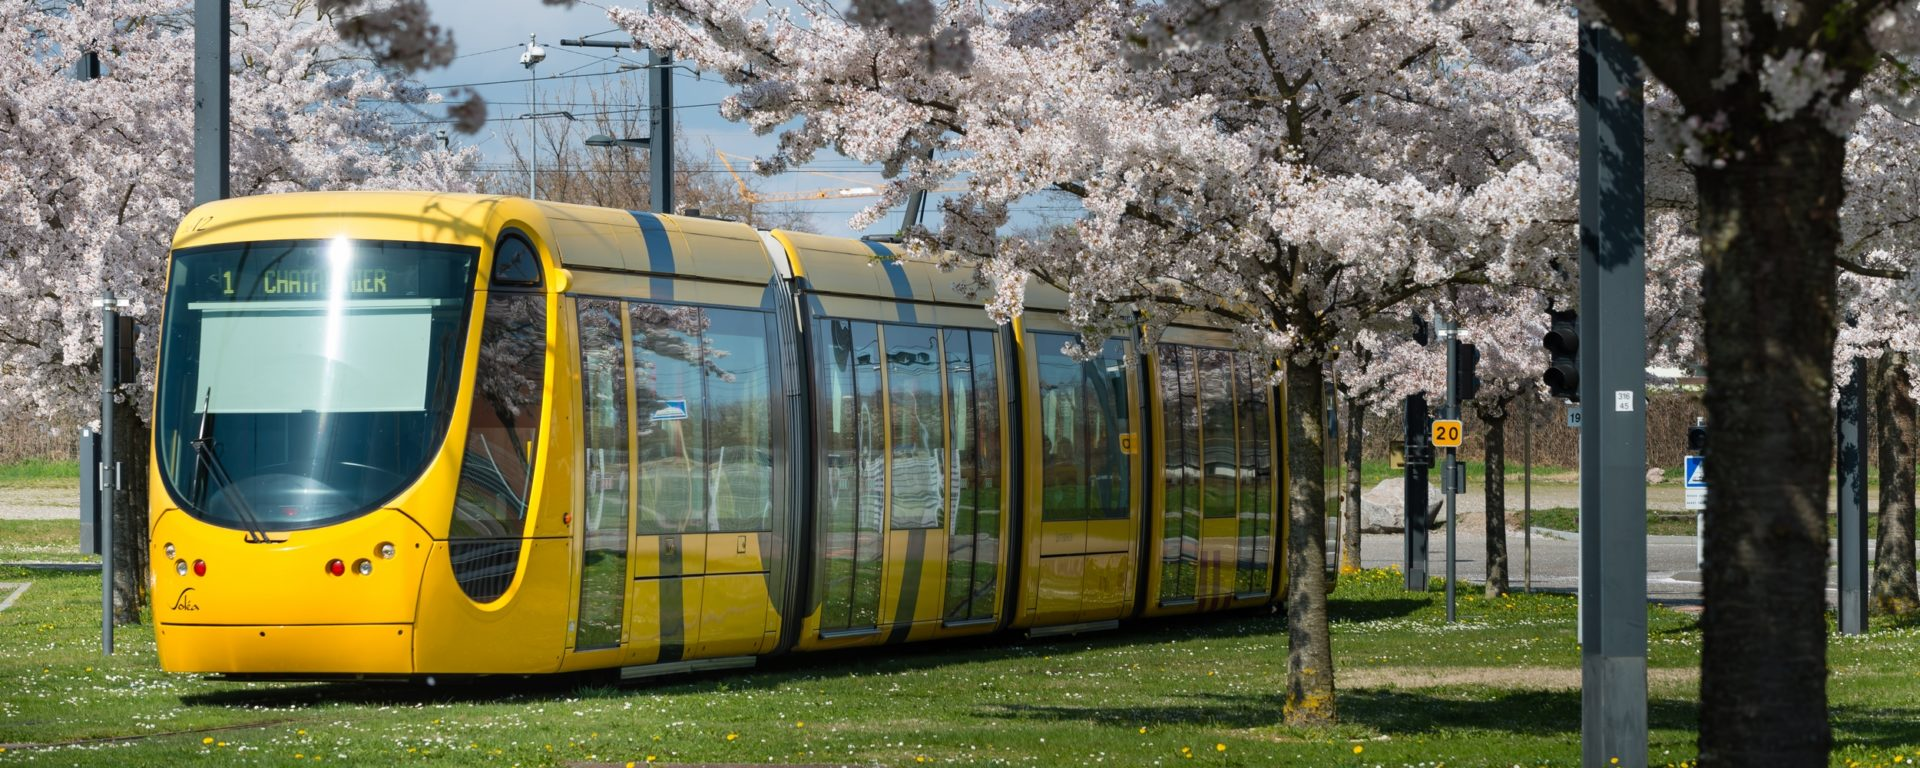 Tramway jaune Transdev Mulhouse réseau transport public transit streetcar yellow mobility company